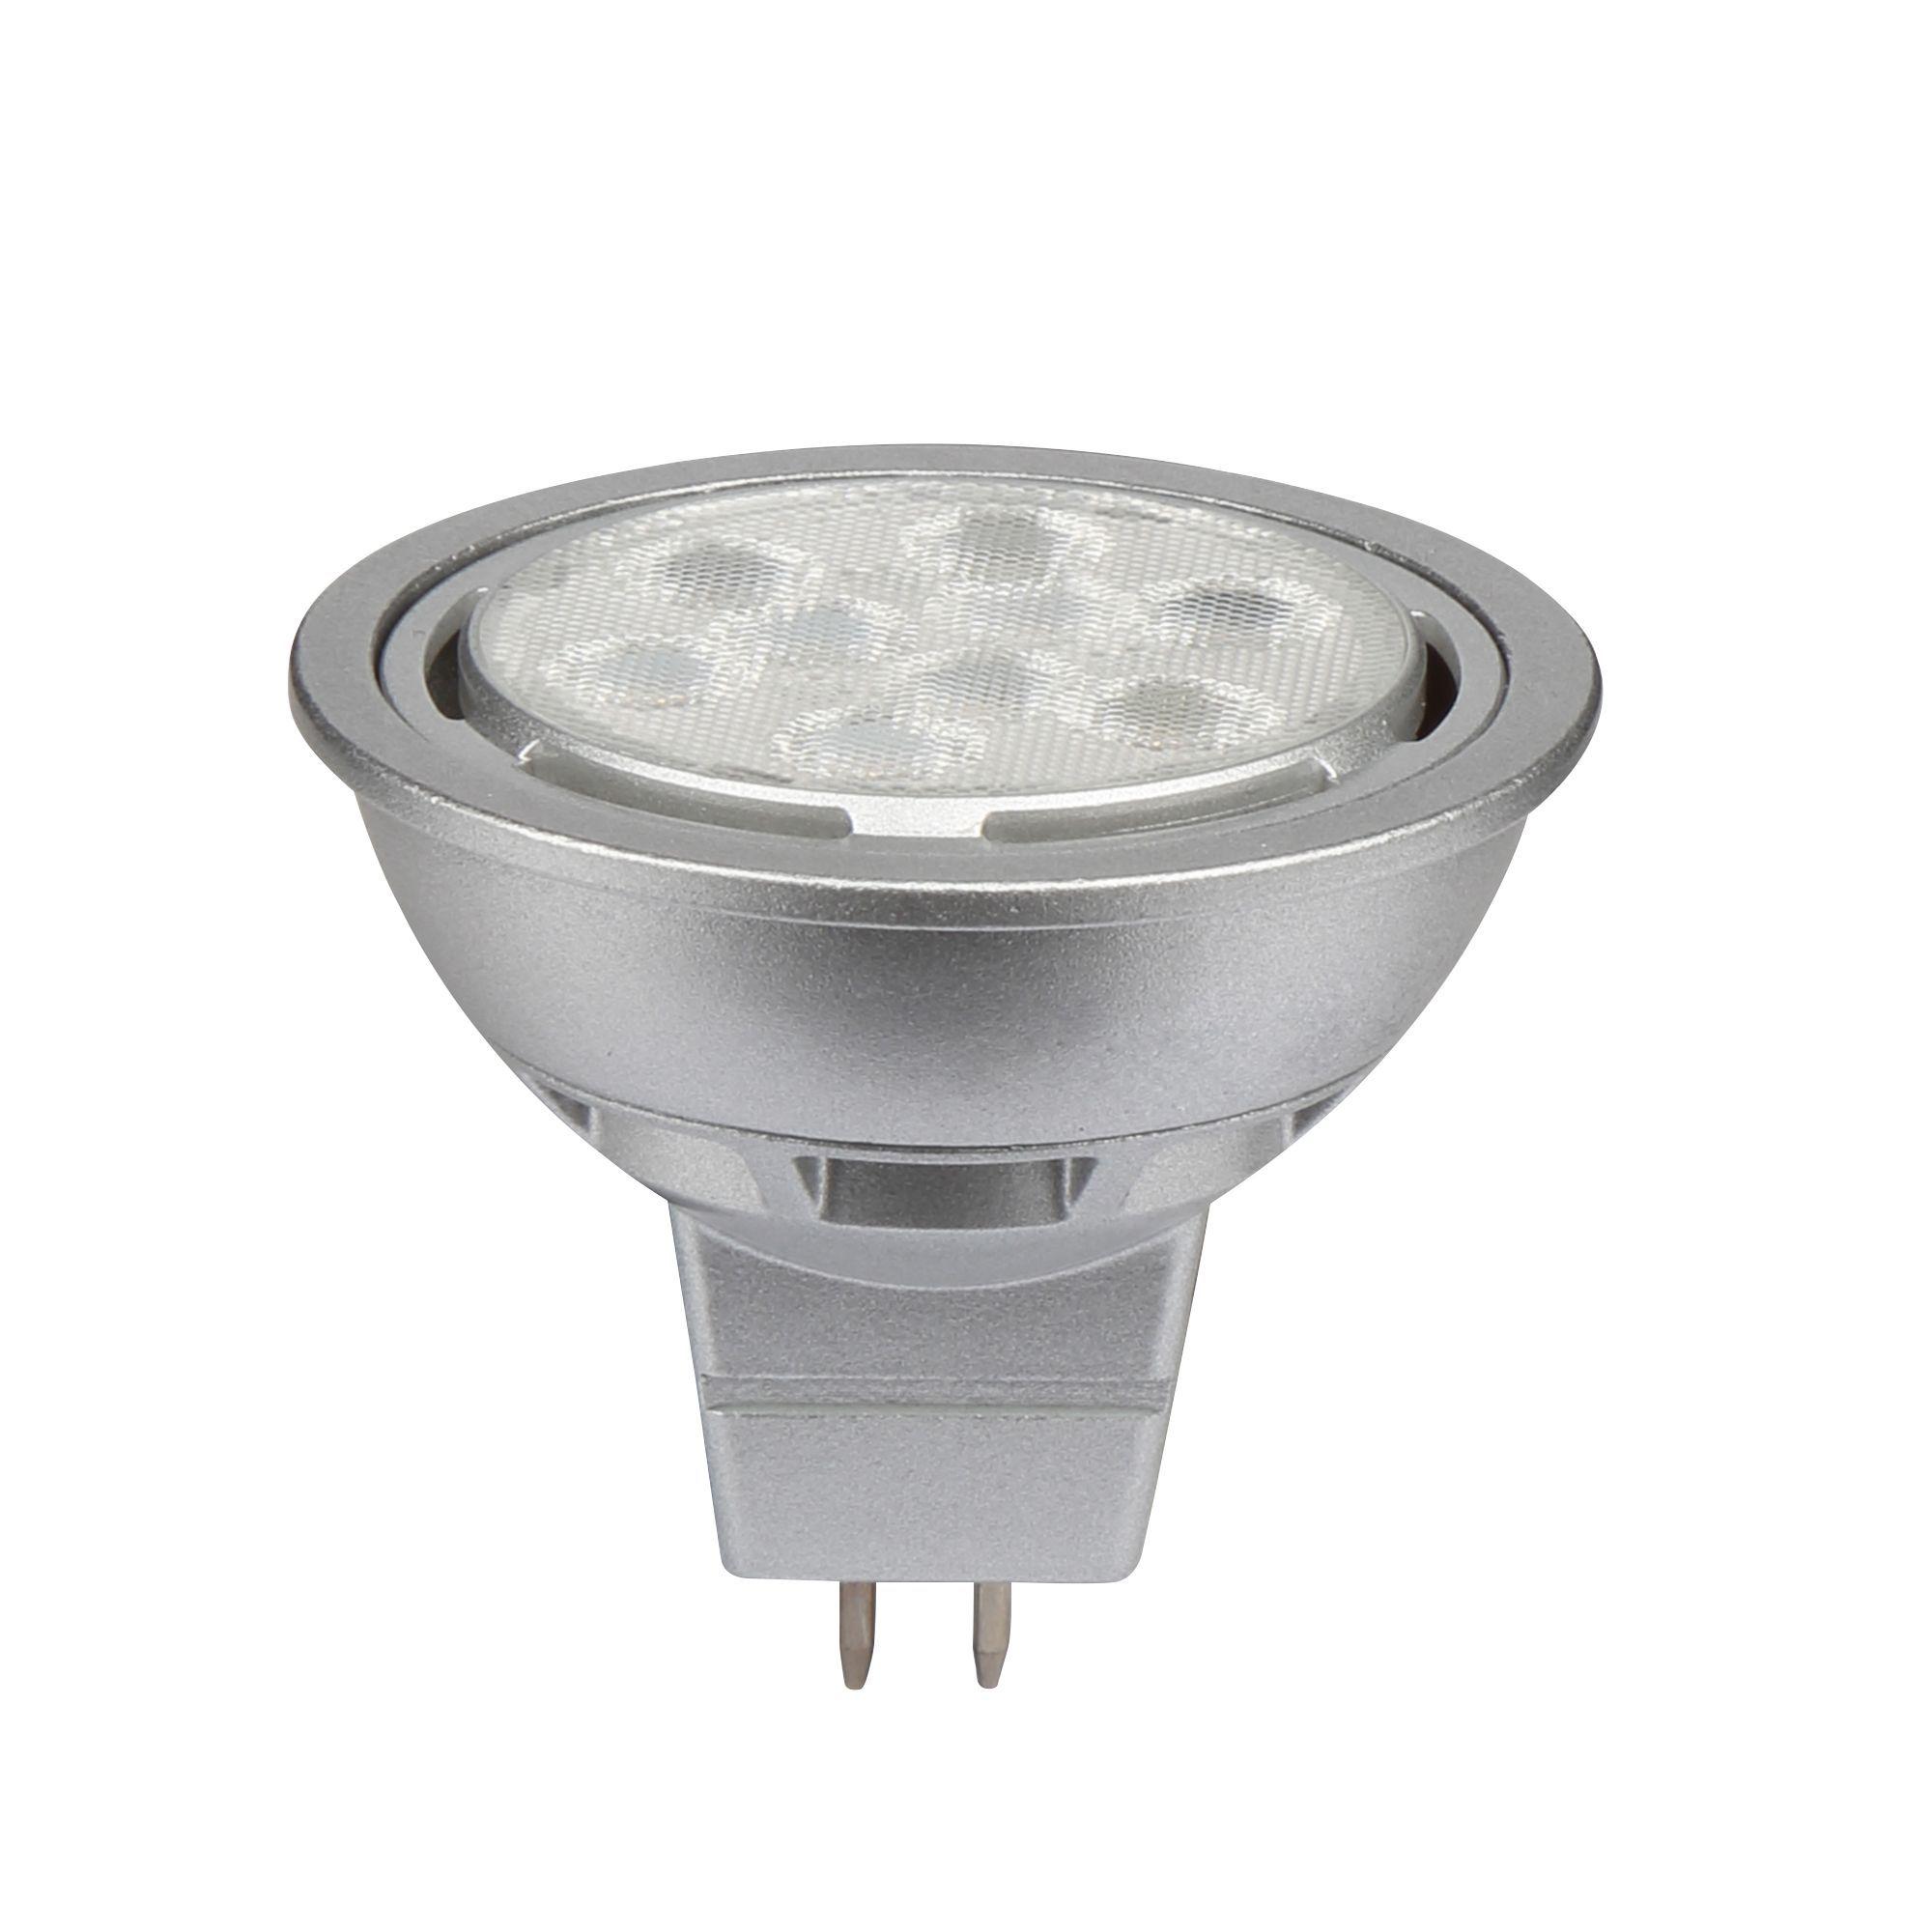 Diall Gu5.3 Mr16 621lm Led Reflector Light Bulb